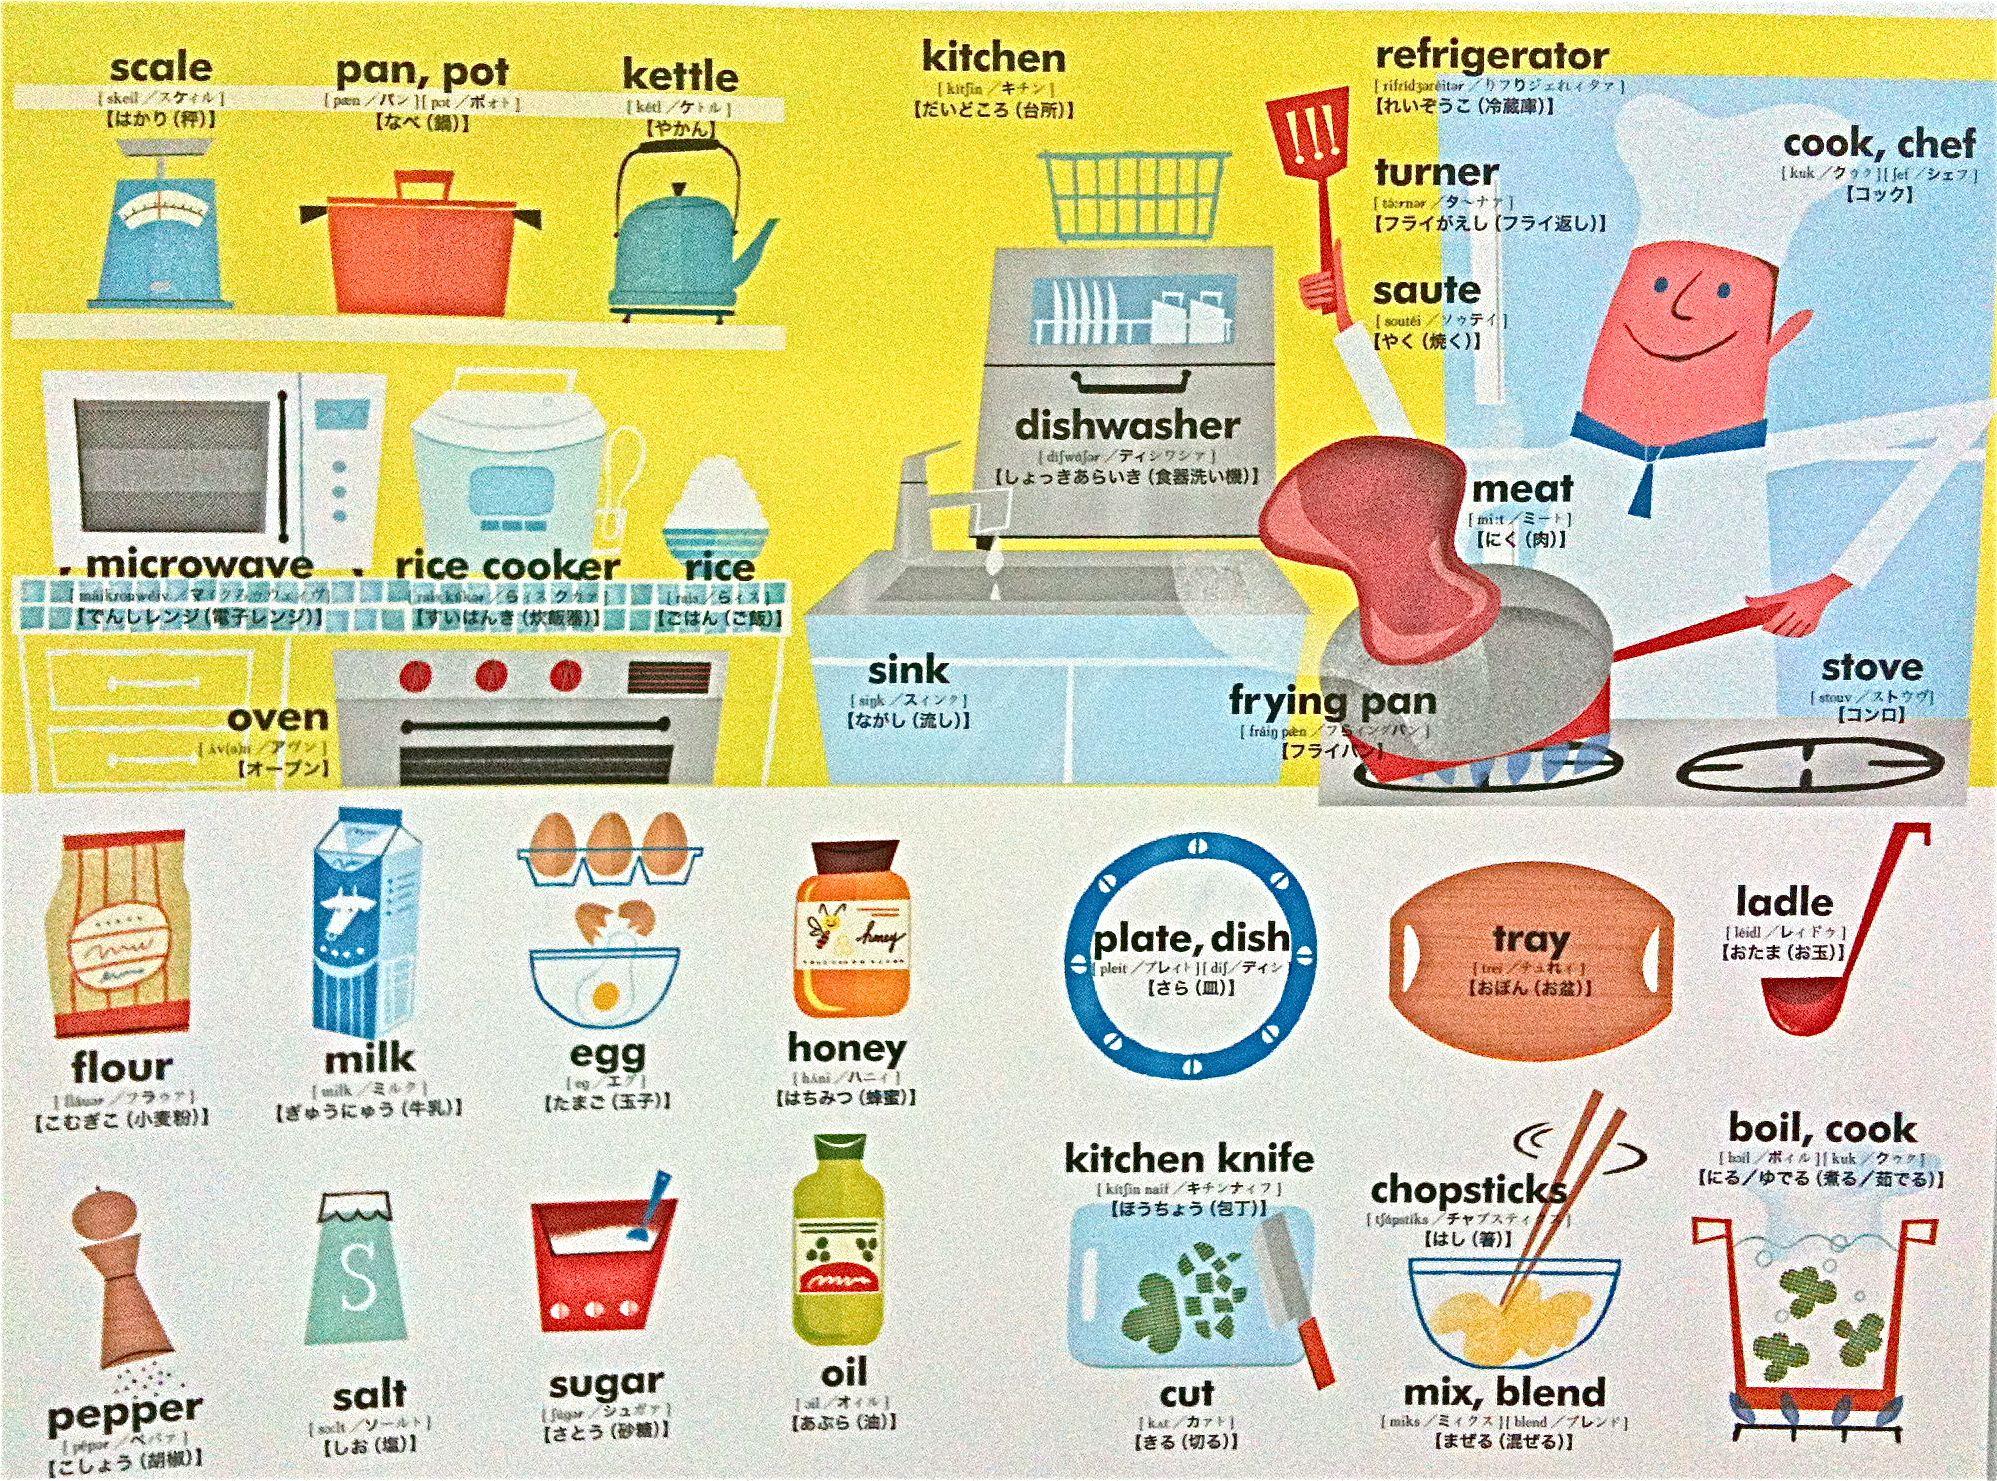 Bedroom furniture names in english - Bedroom Furniture Names In English 40